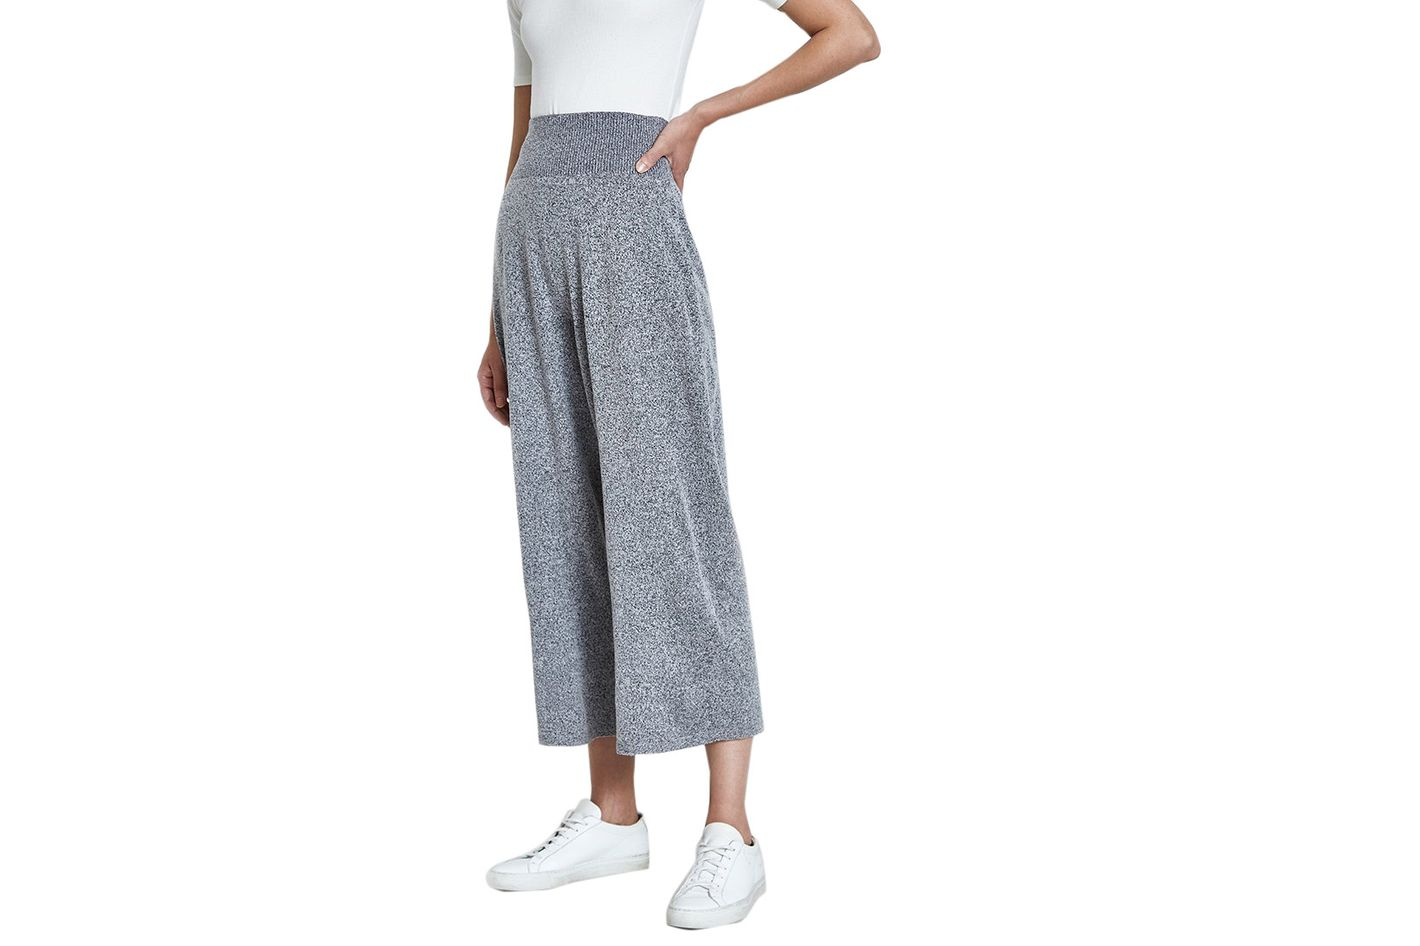 SORI High Waist Pants in Gray